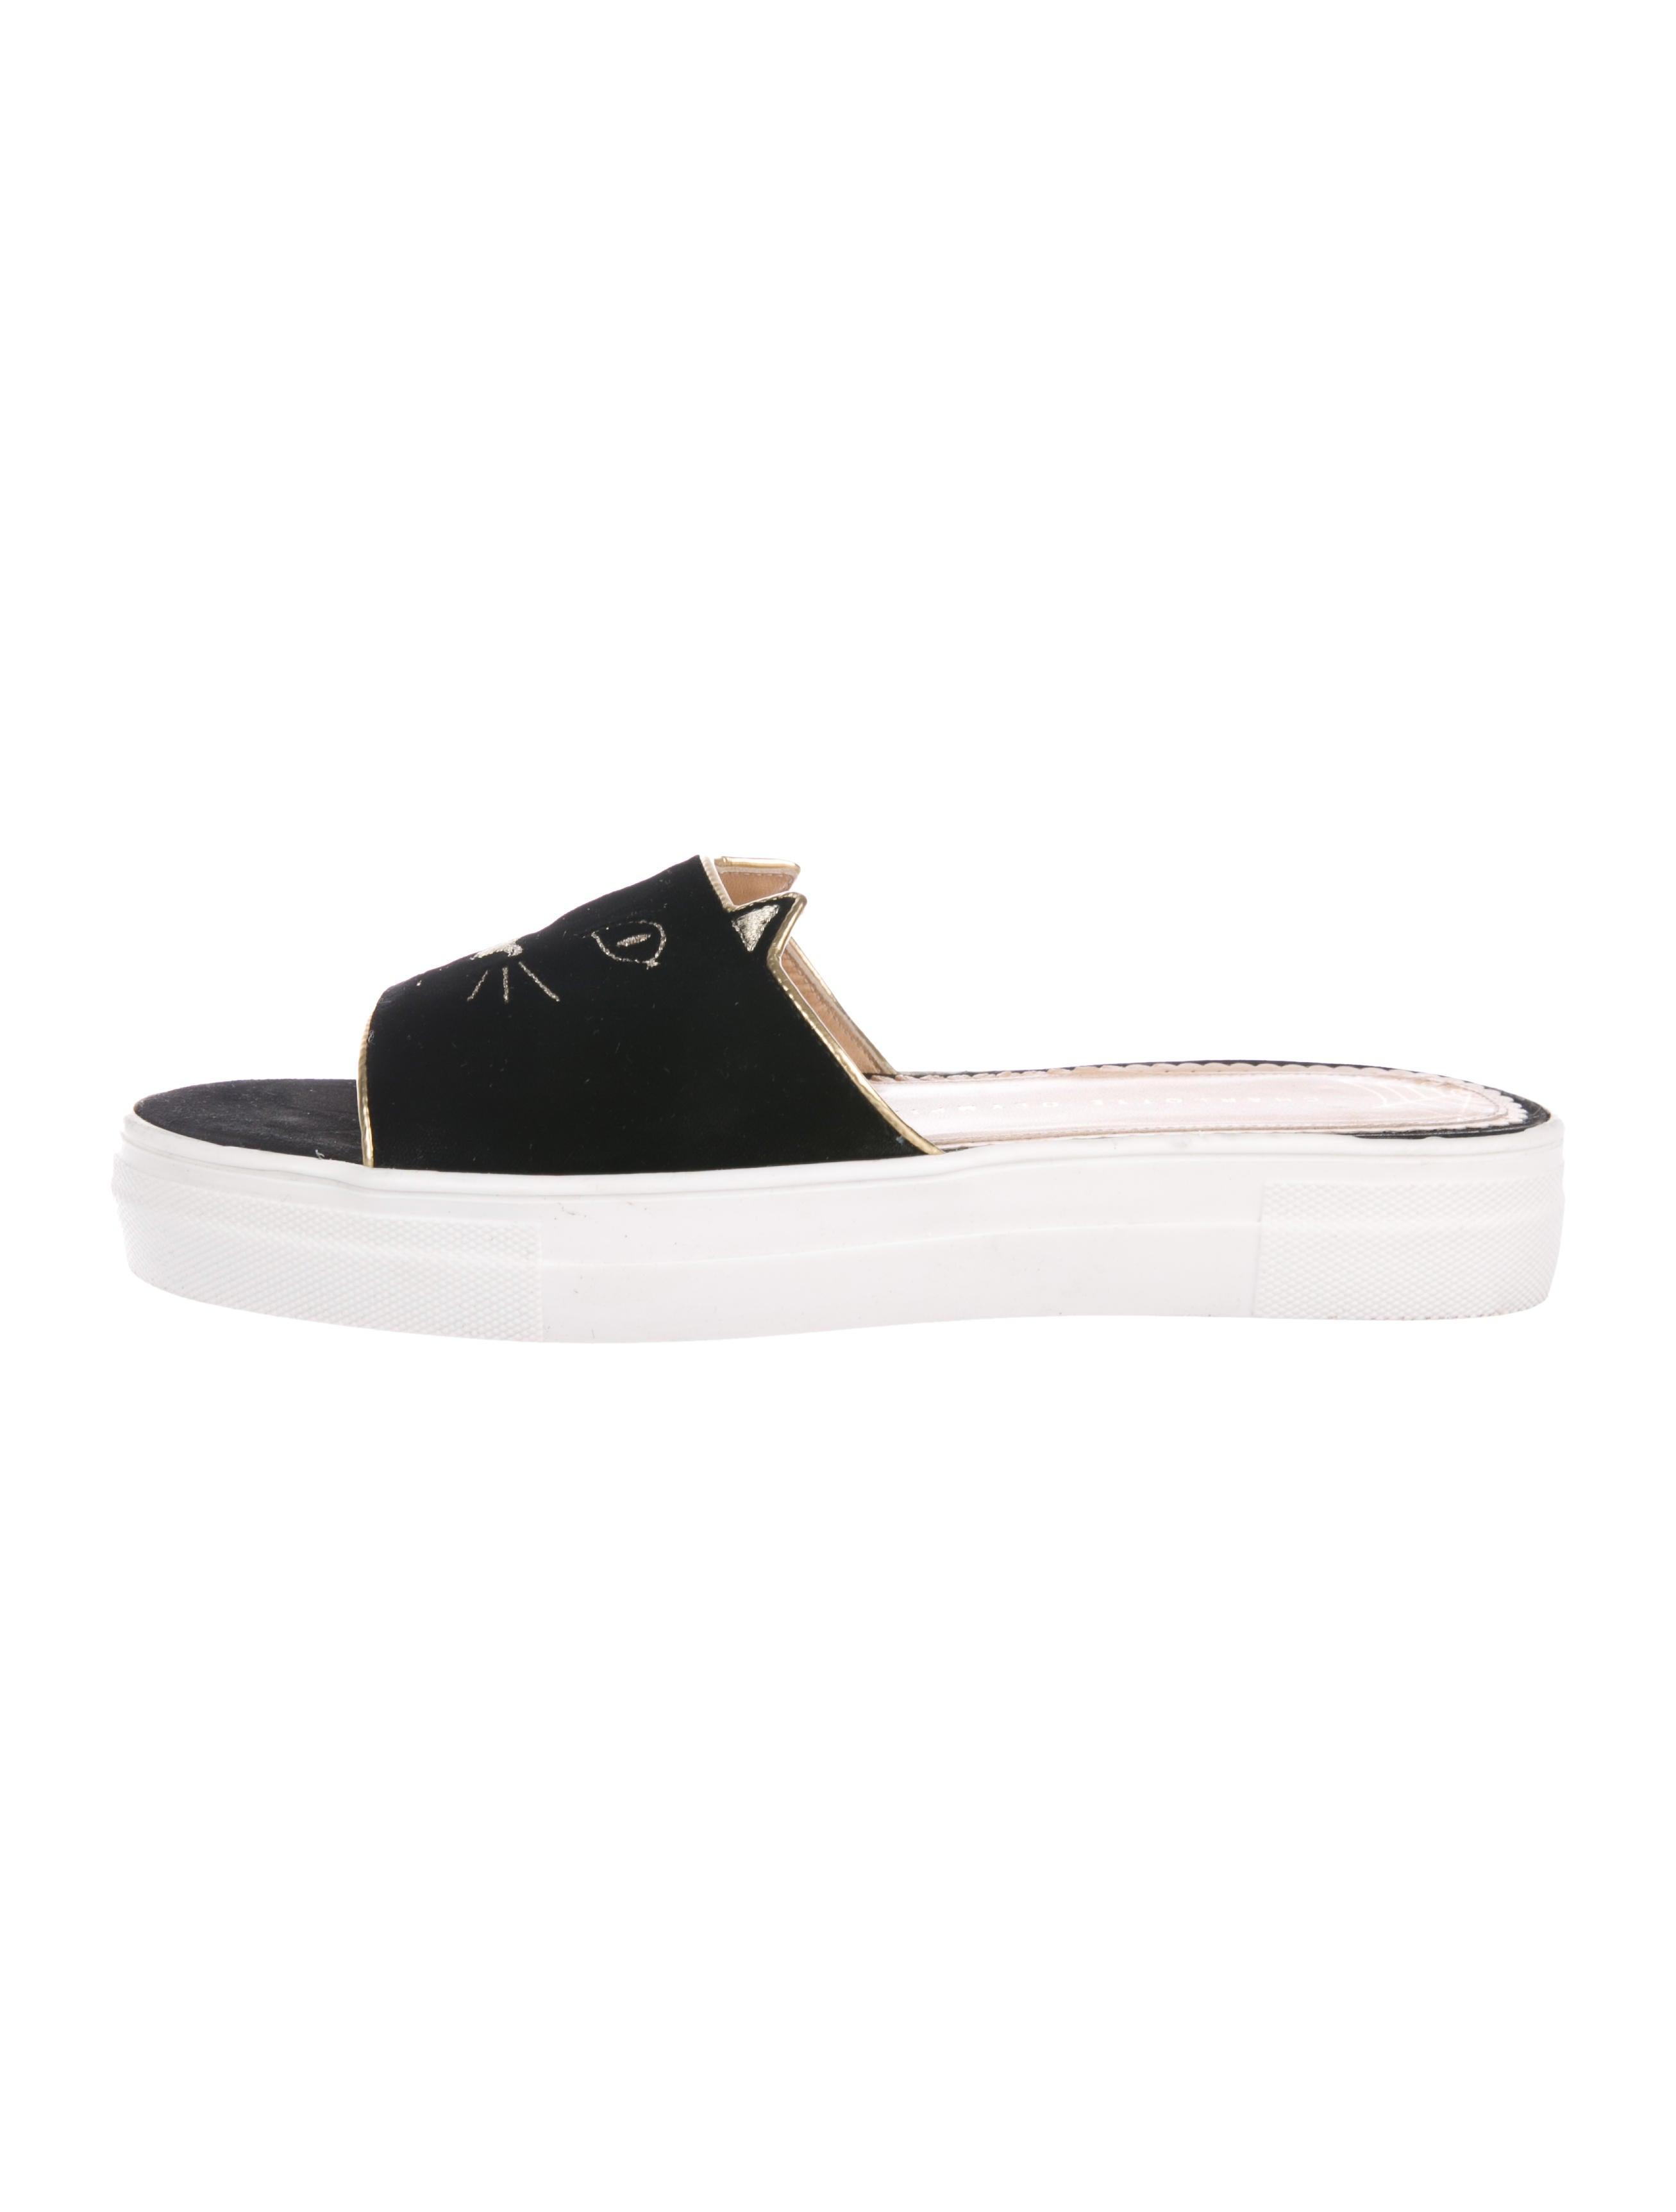 c30d26f8a Charlotte Olympia Kitty Pool Velvet Slides - Shoes - CIO27858